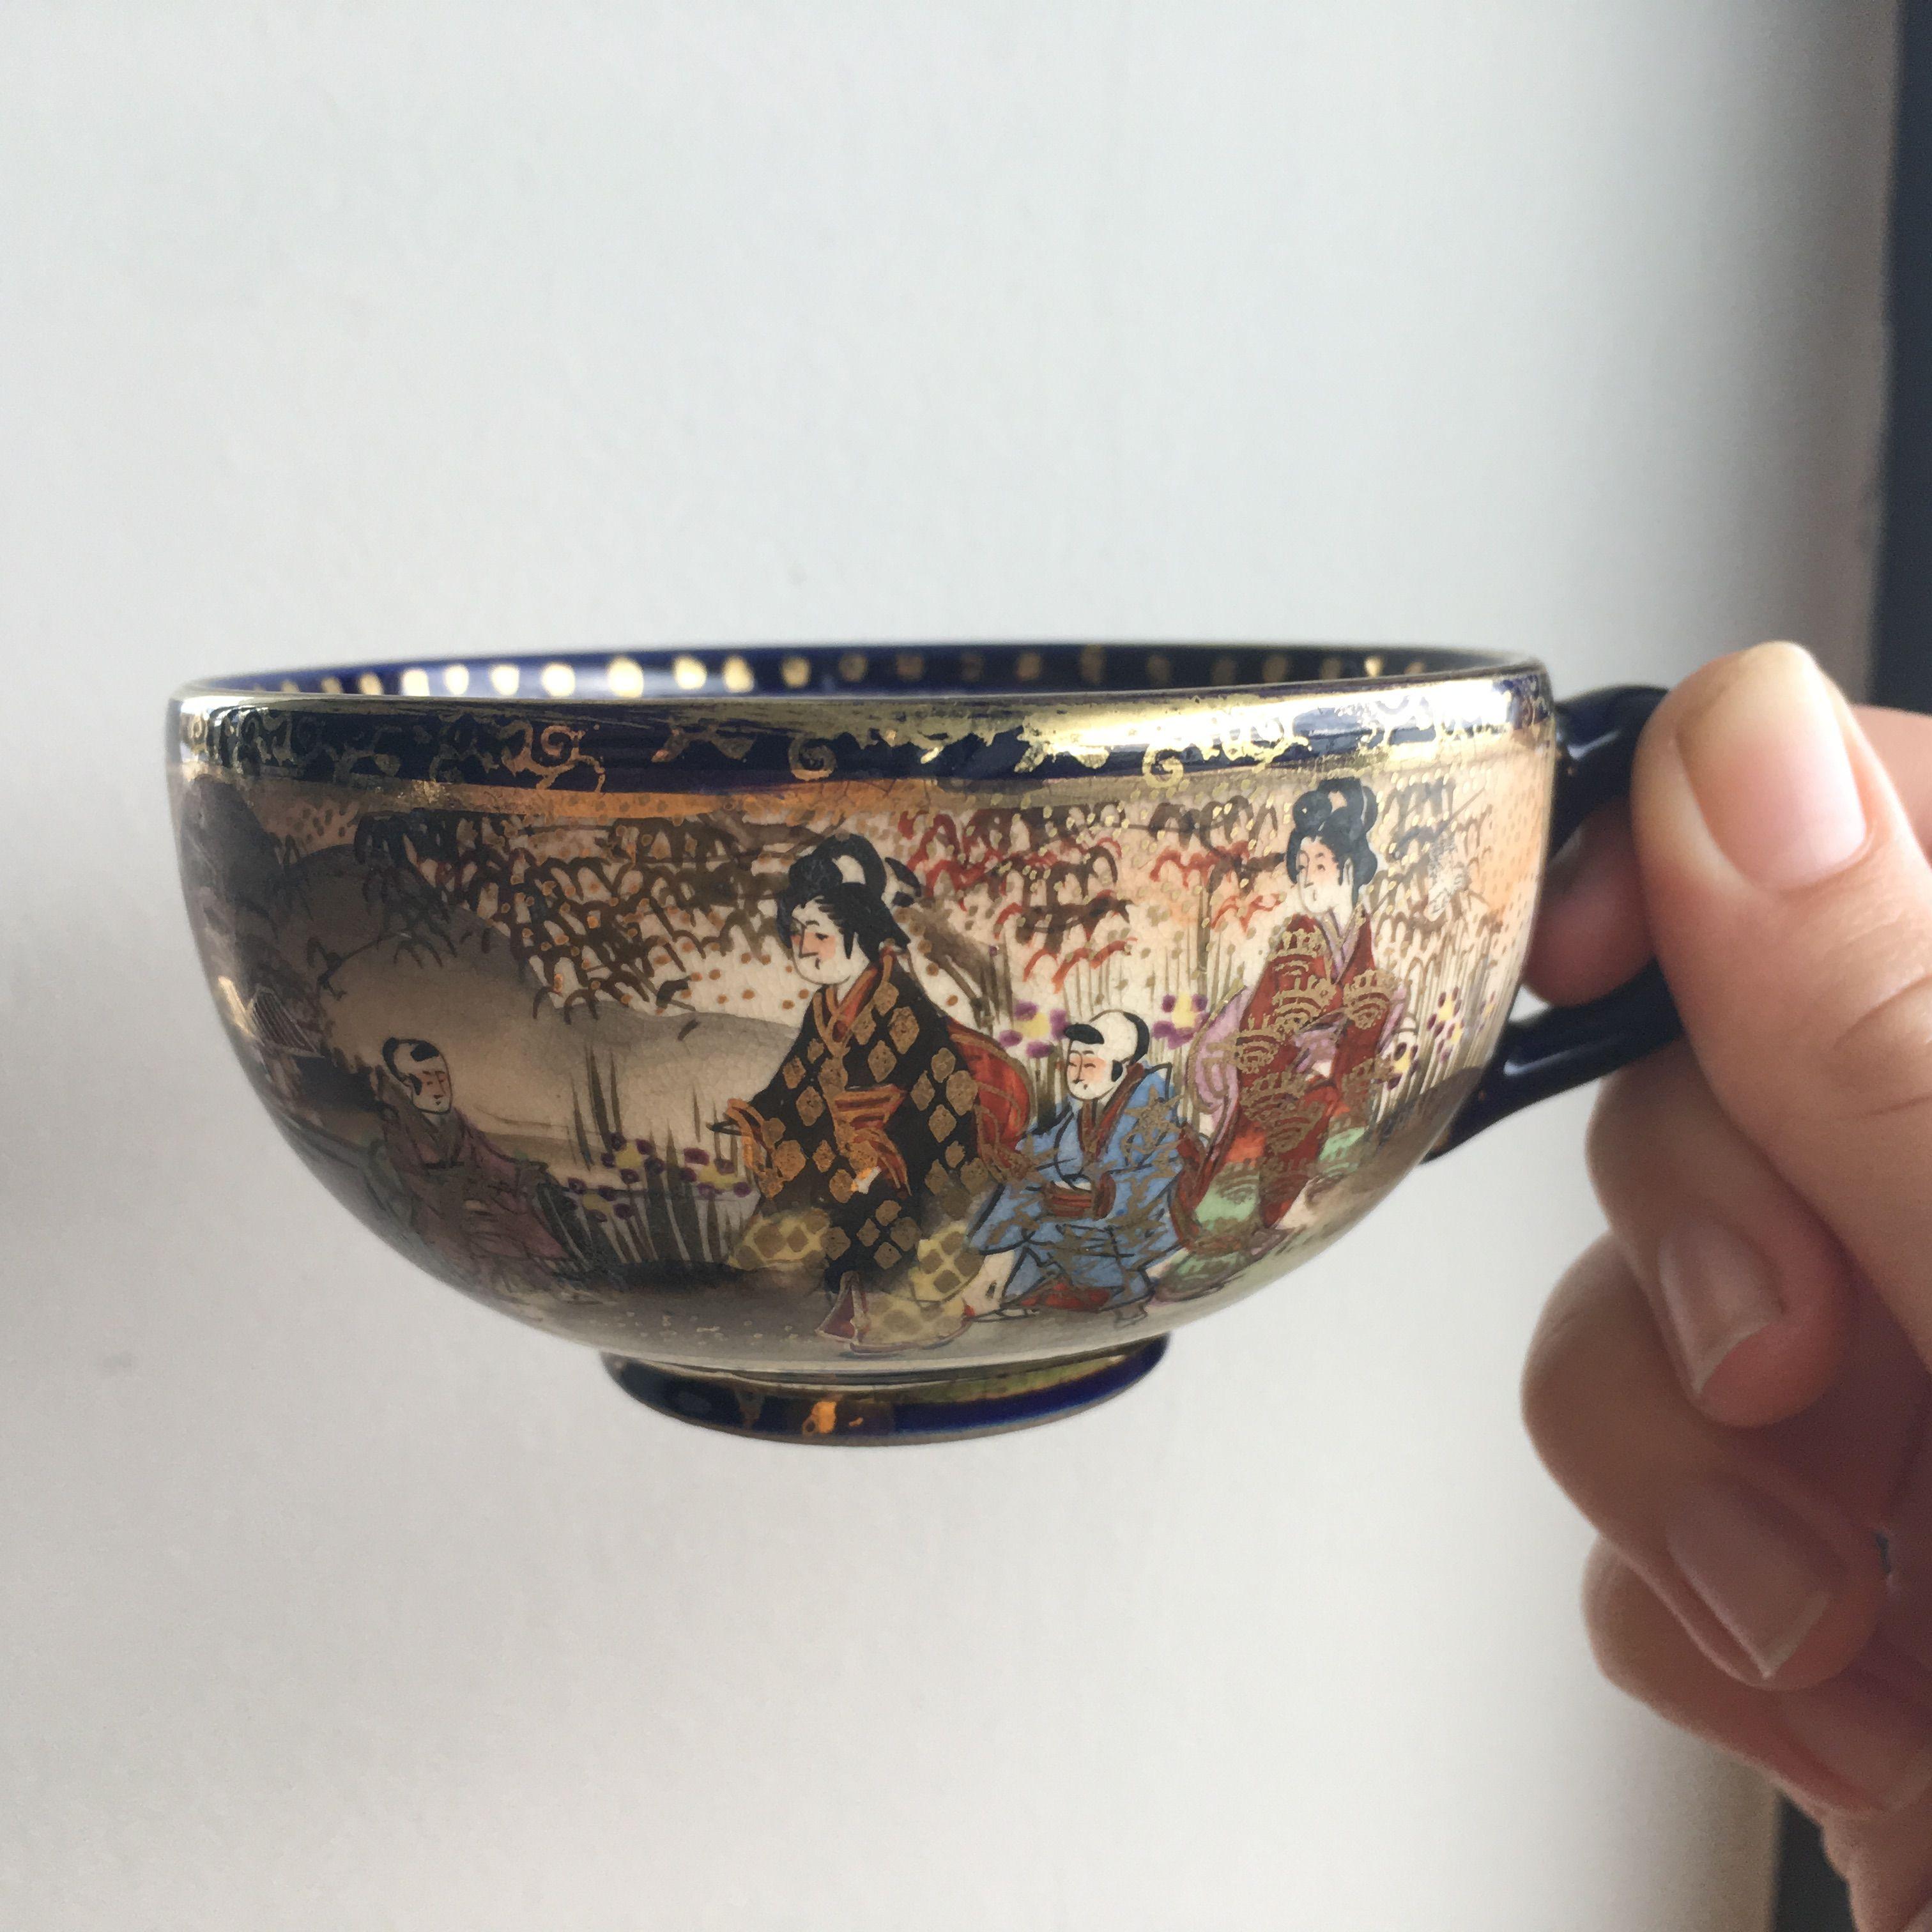 Beautiful Vintage Cup X Etsy China Vintage Vintagechina Oriental Sydney Japan Chinese Japanese Tea Vintage Vintage China